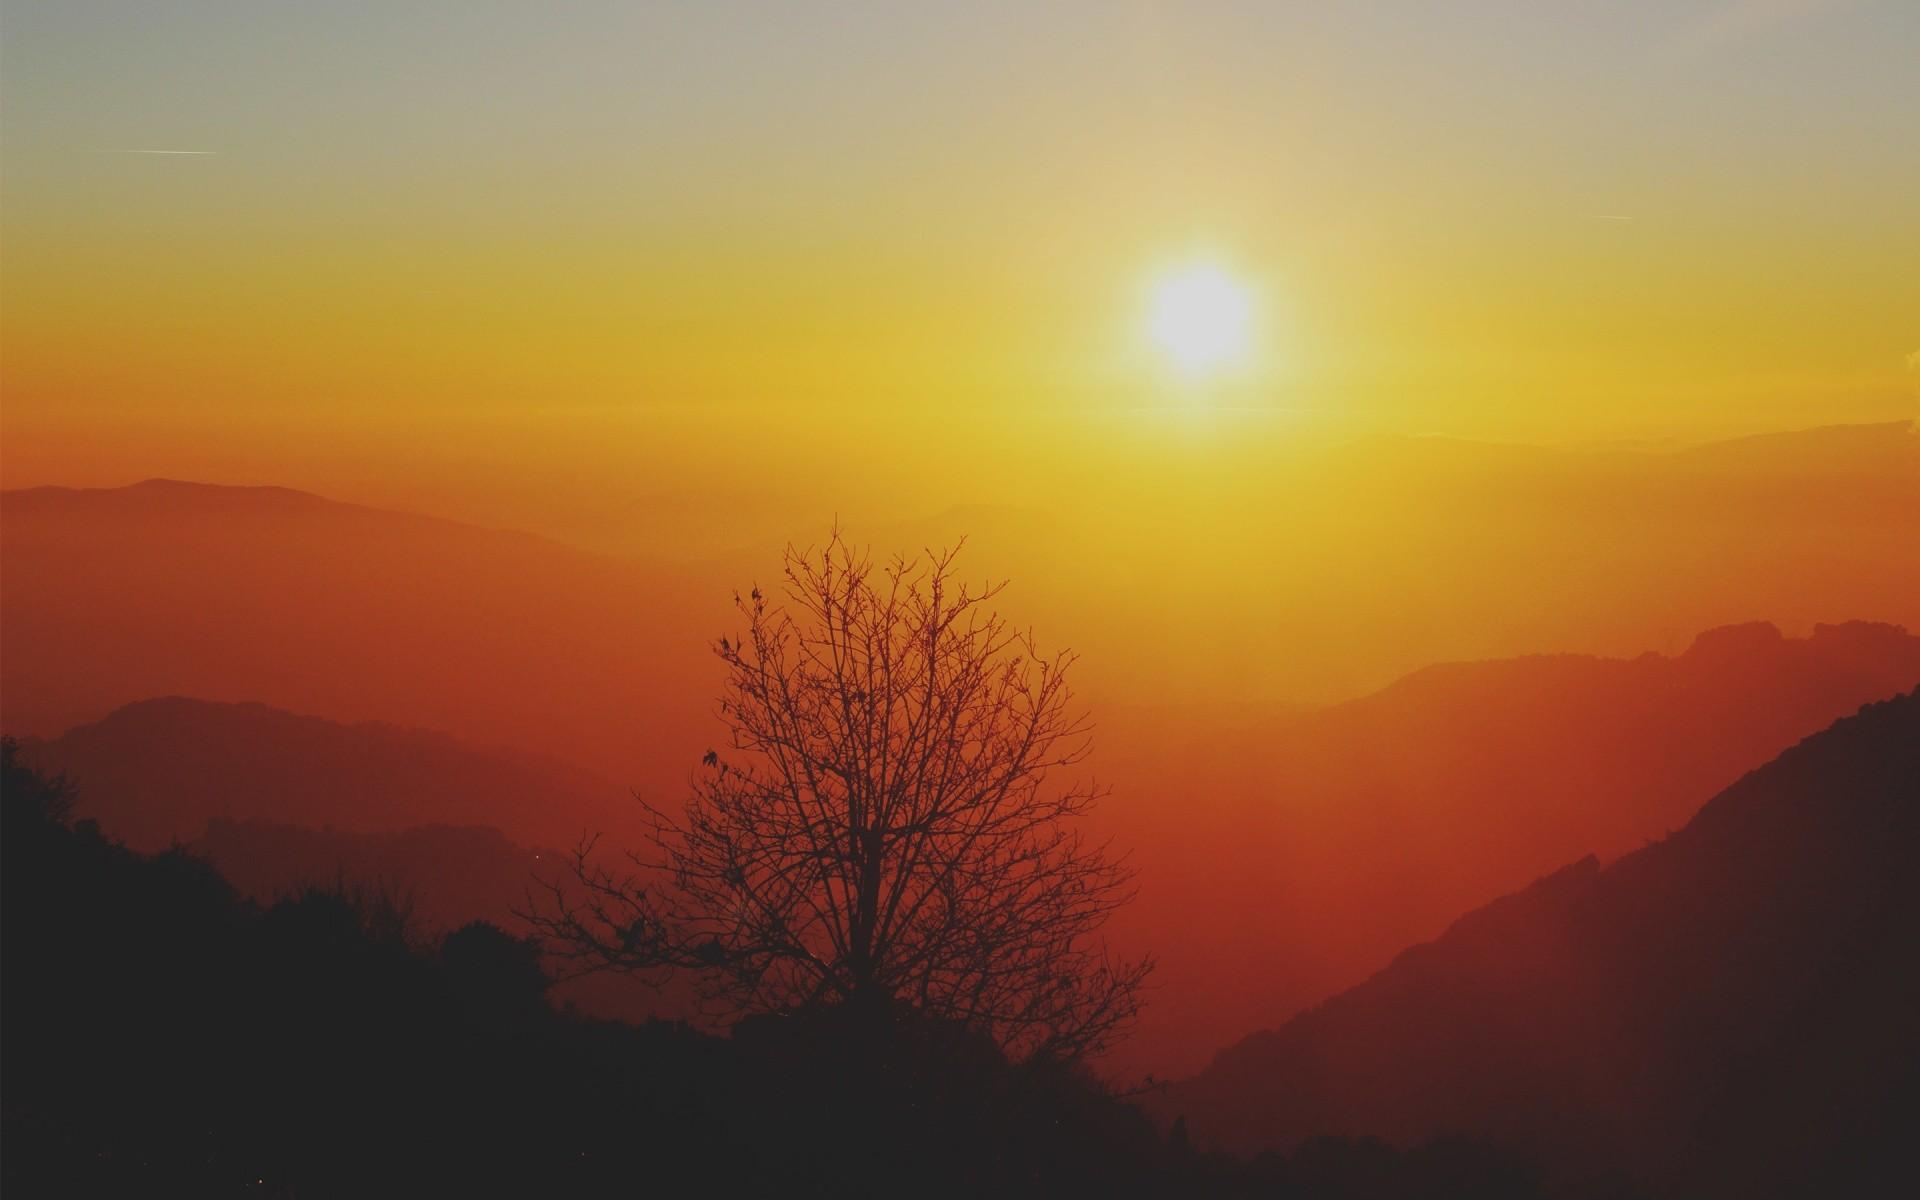 Free Sunrise phone wallpaper by jape0358